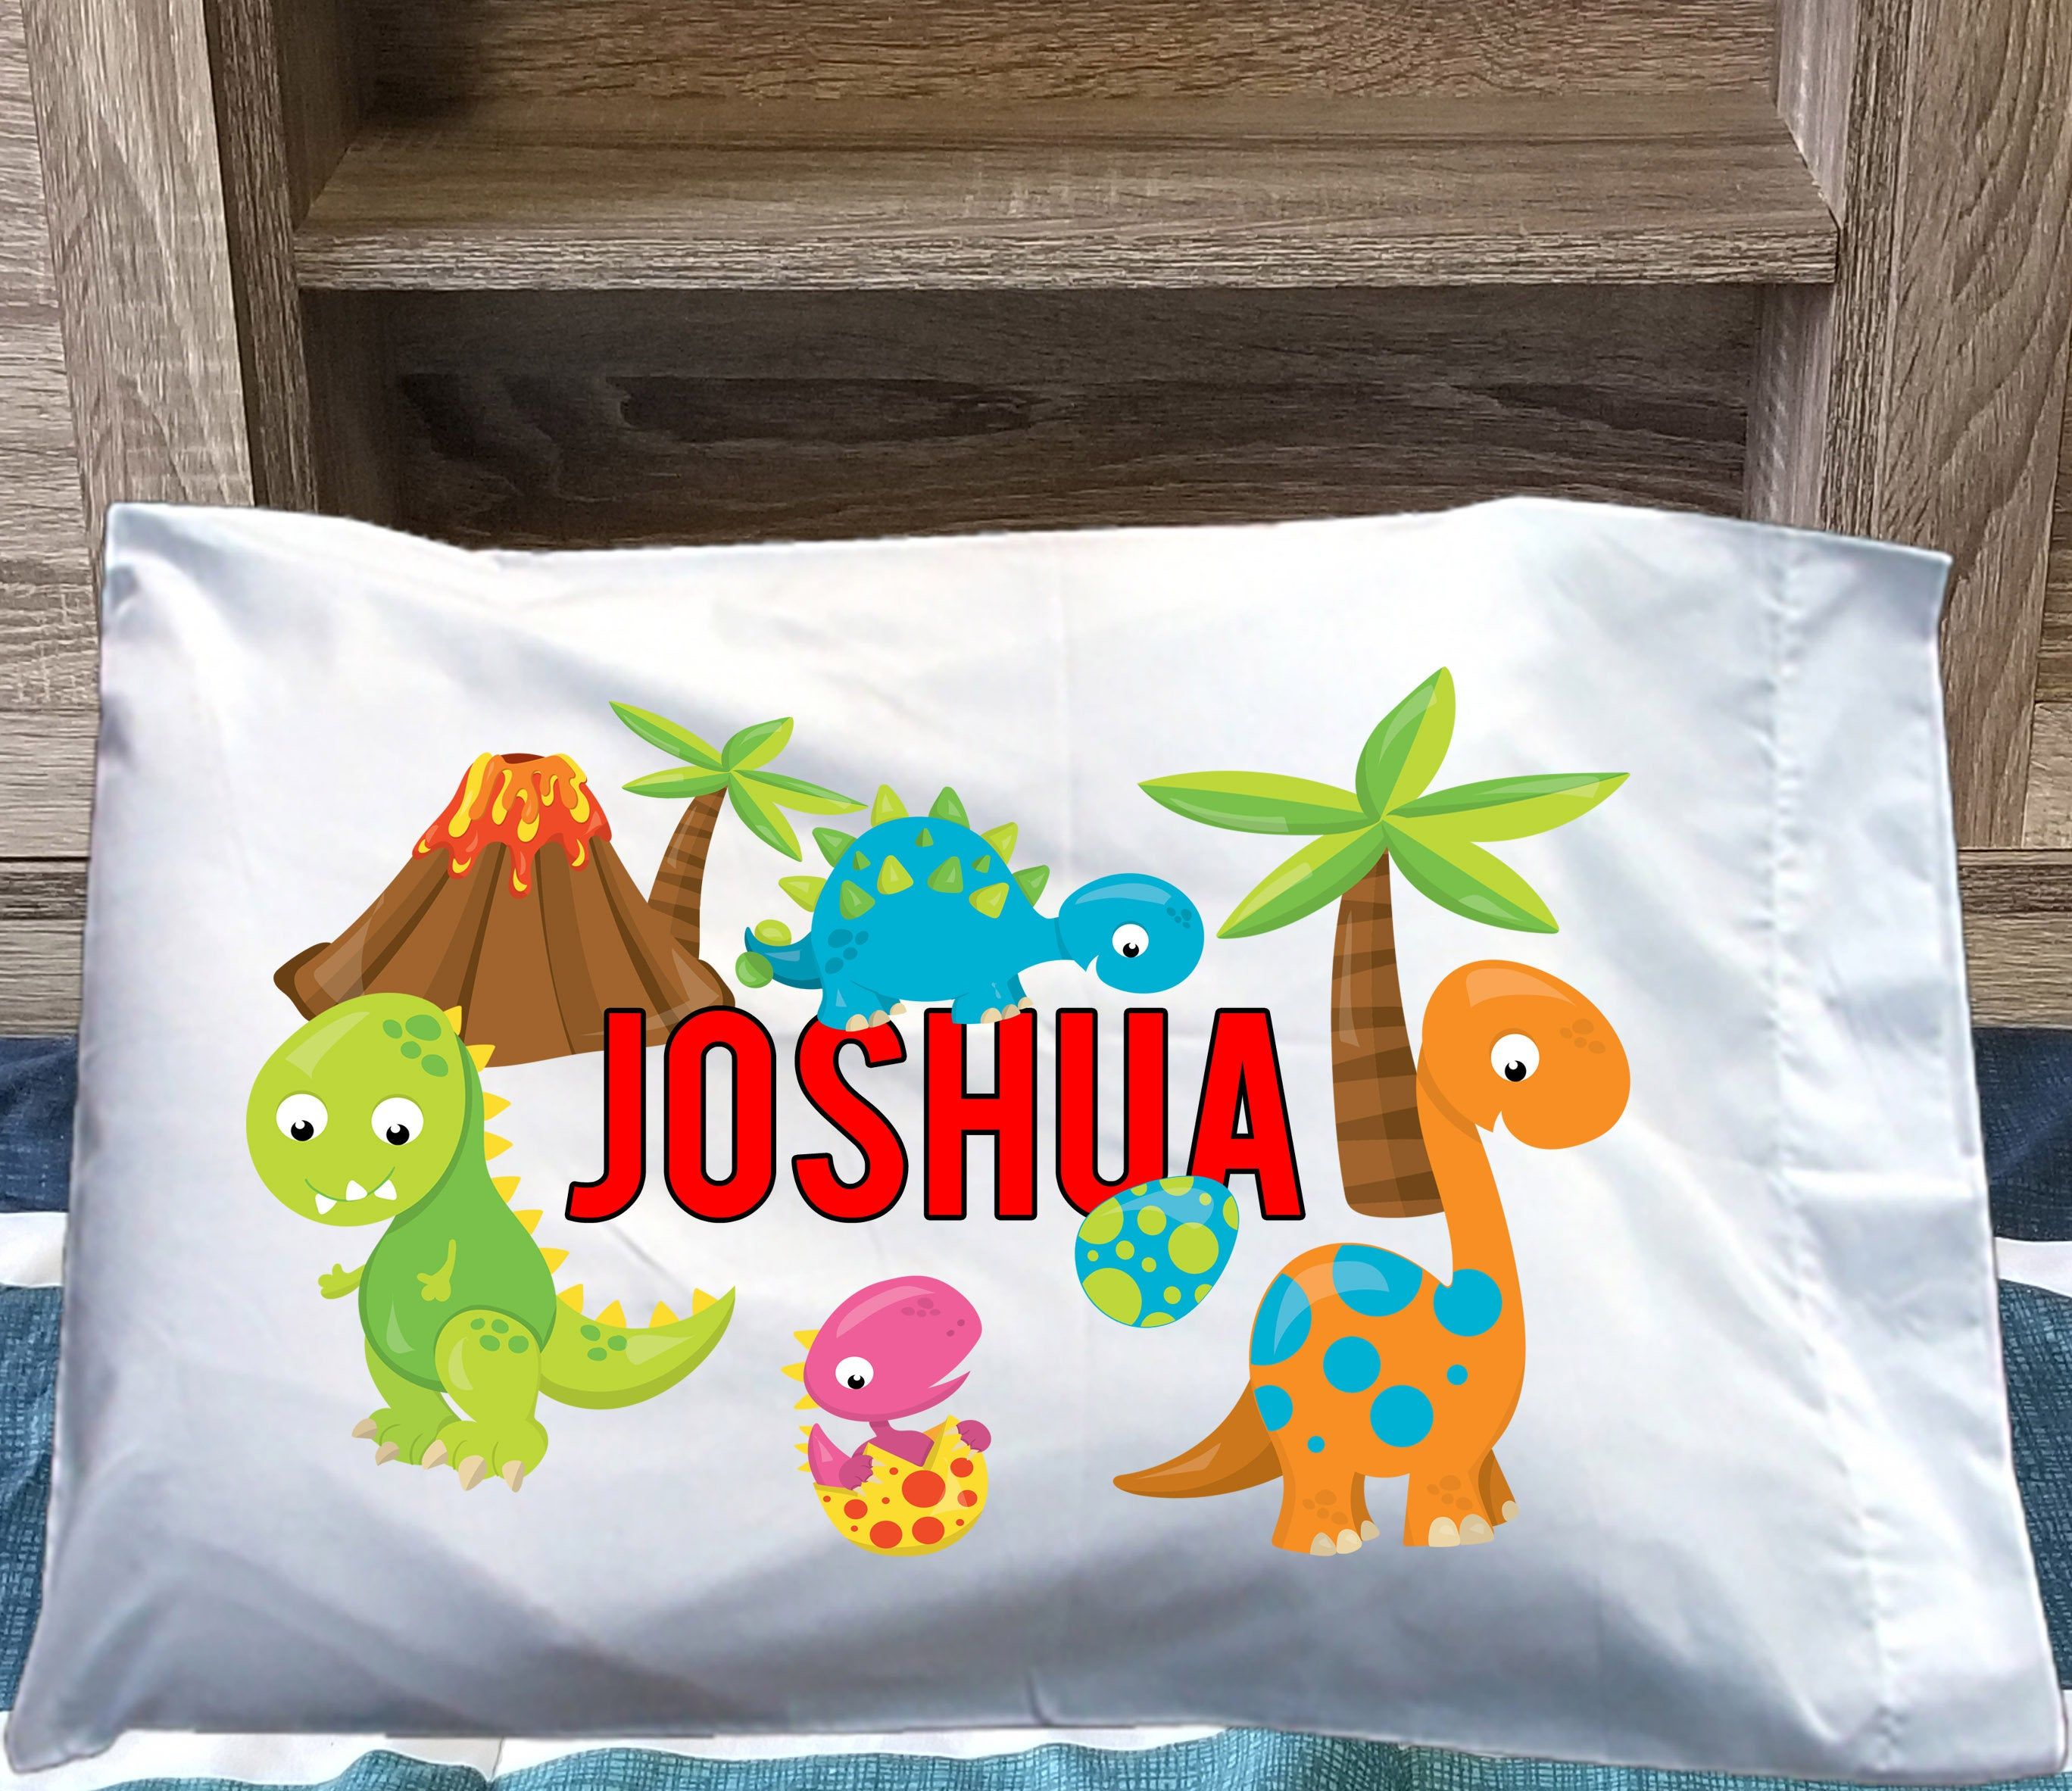 Dinosaur Kids Pillowcase Dinosaur Pillowcase Personalized Etsy Kids Pillow Cases Personalized Pillow Cases Dinosaur Kids